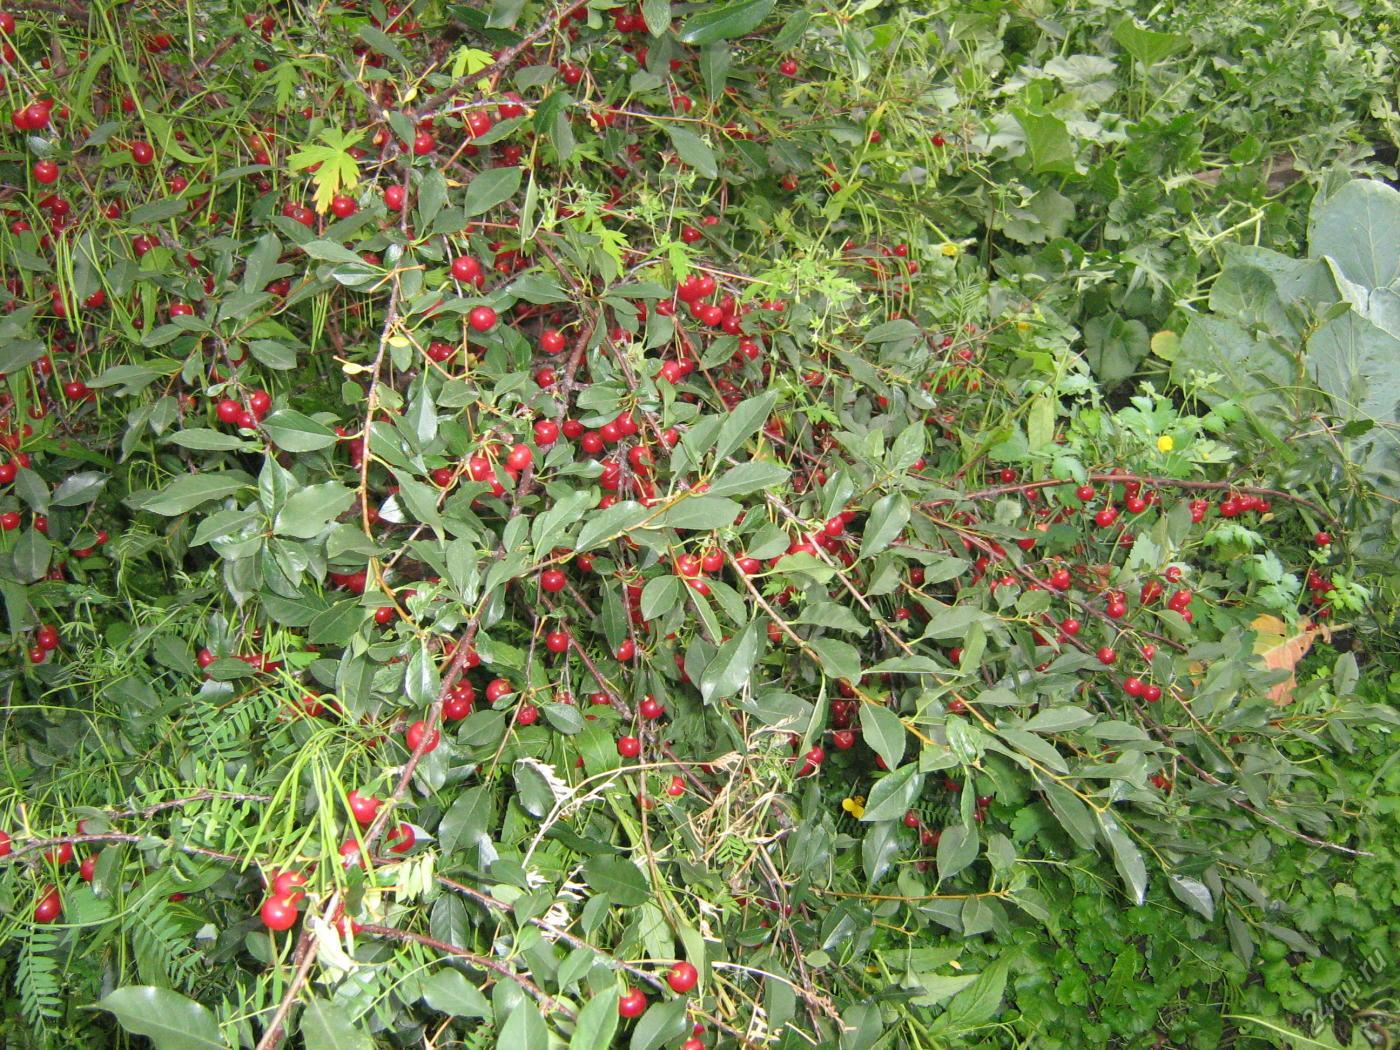 Кустовая вишня, посадка и уход. Кустовая вишня: сорта, посадка, уход и фото